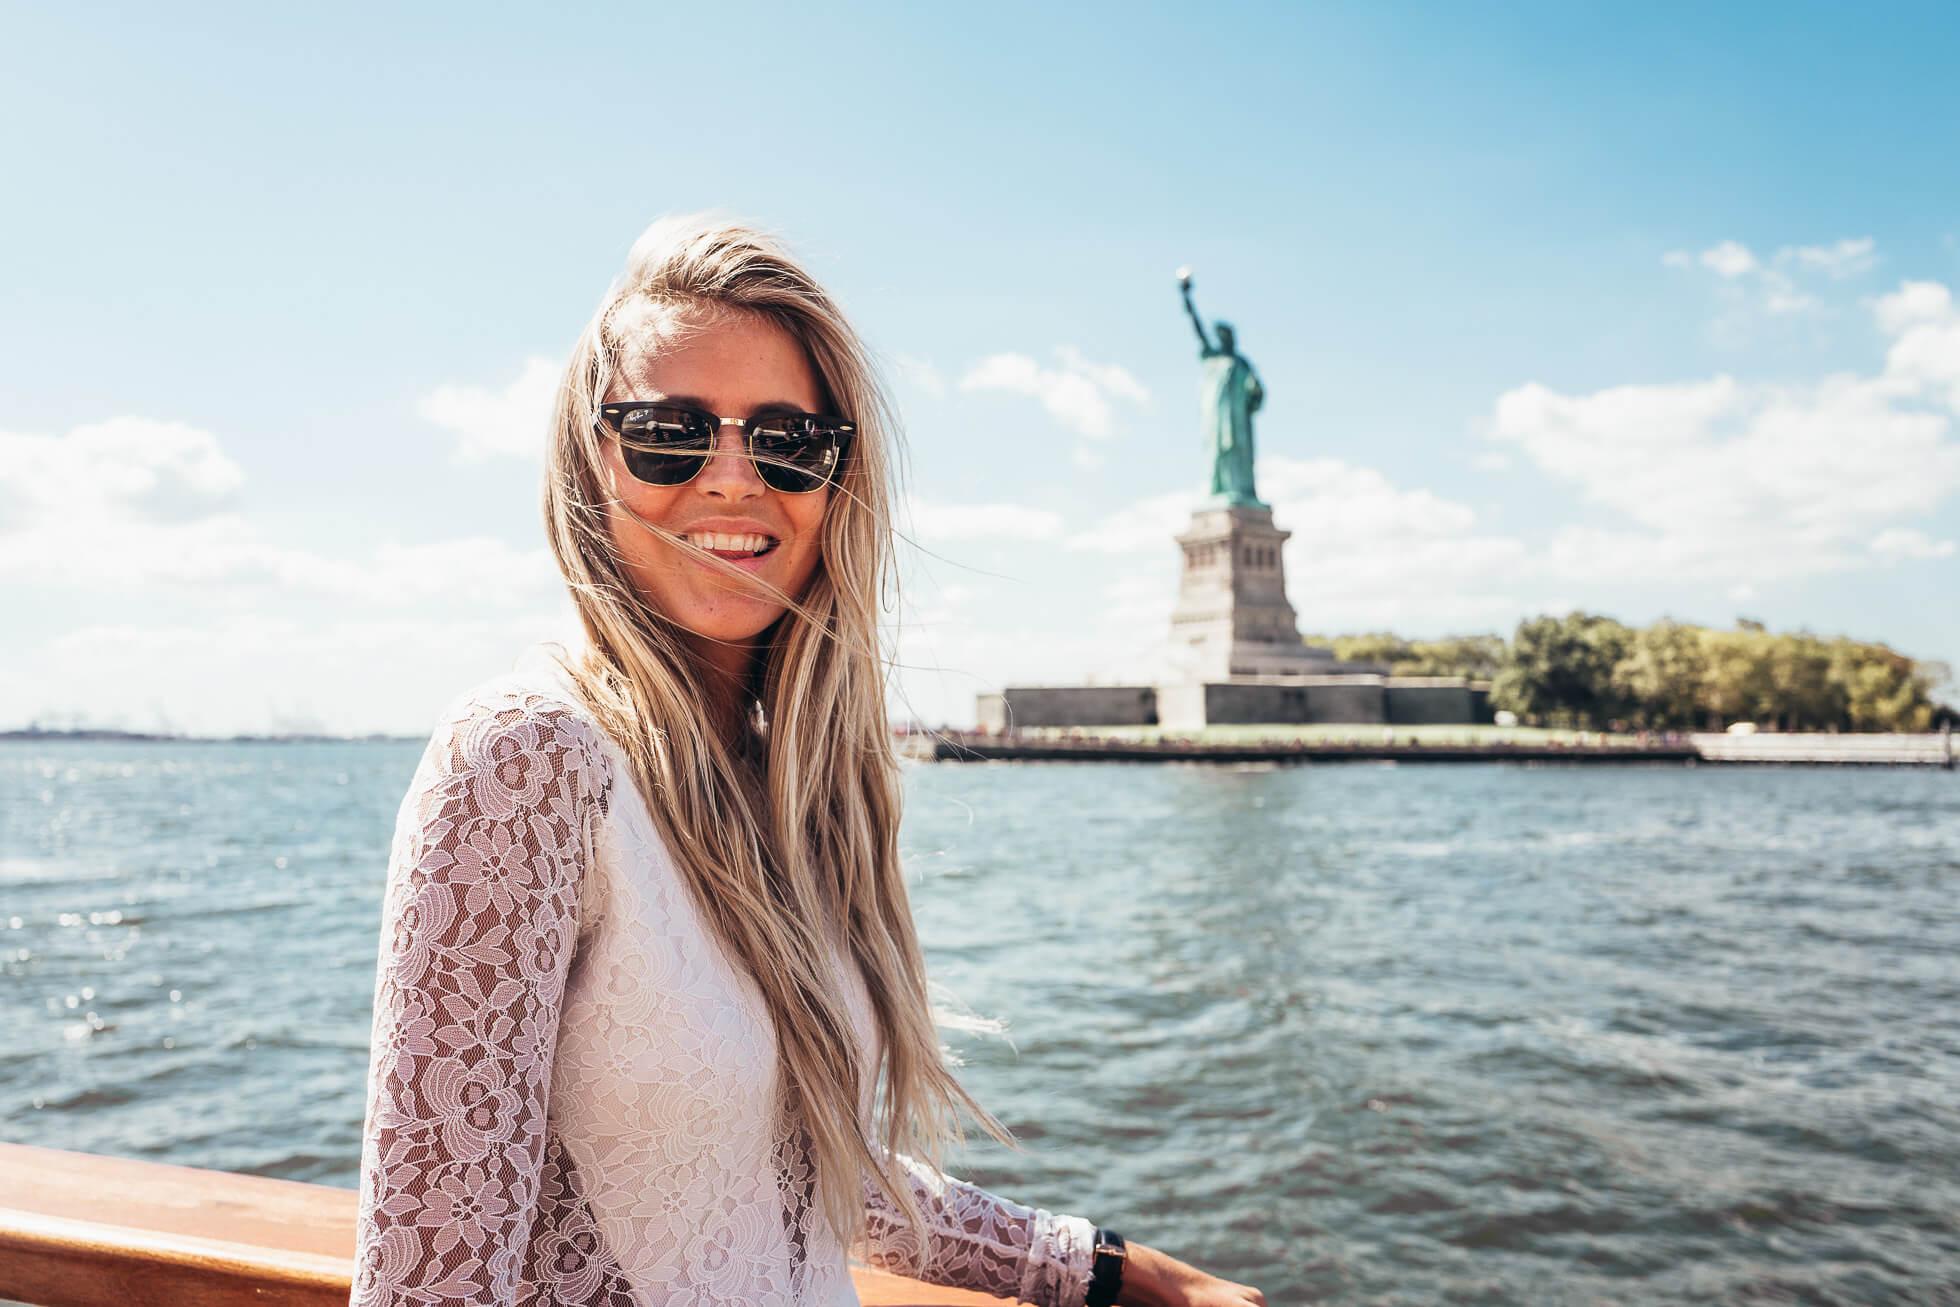 janni-deler-new-york-tour-boatL1090408